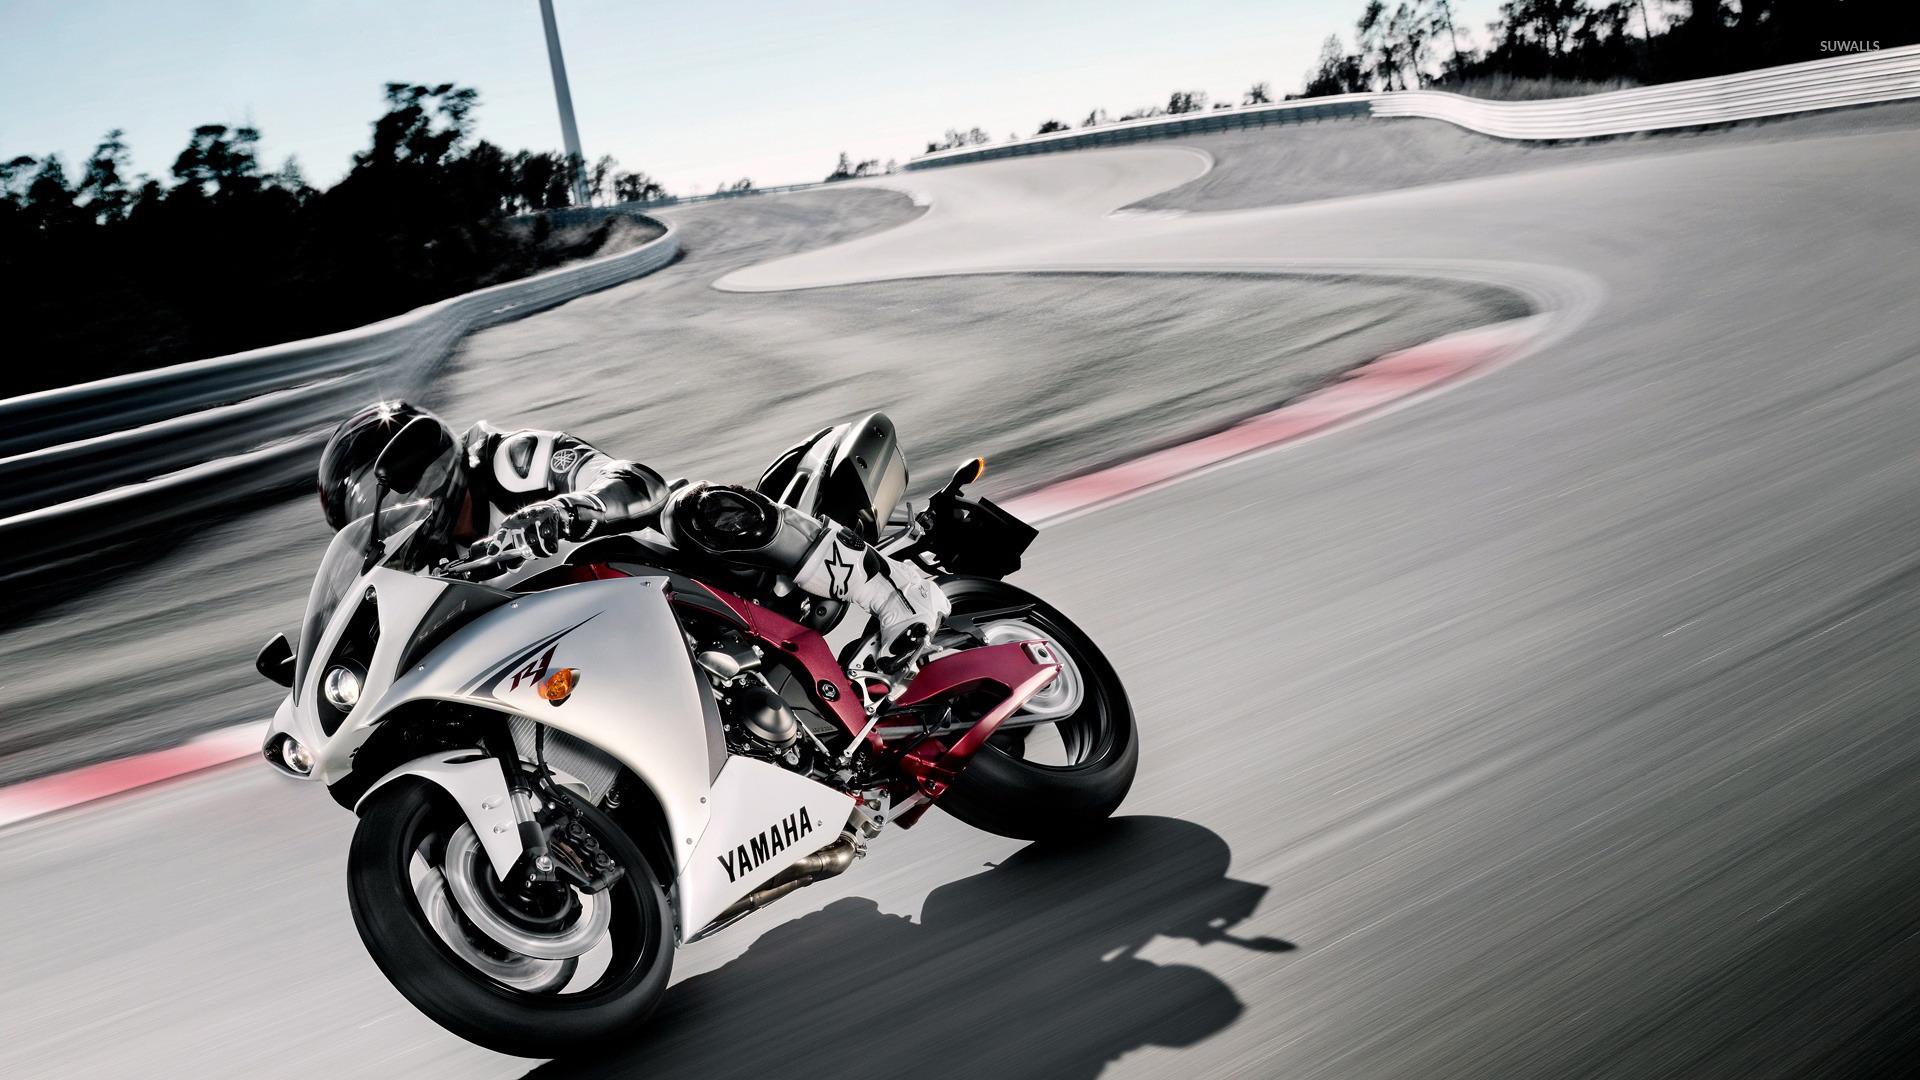 Yamaha Yzf R1 6 Wallpaper Motorcycle Wallpapers 24063